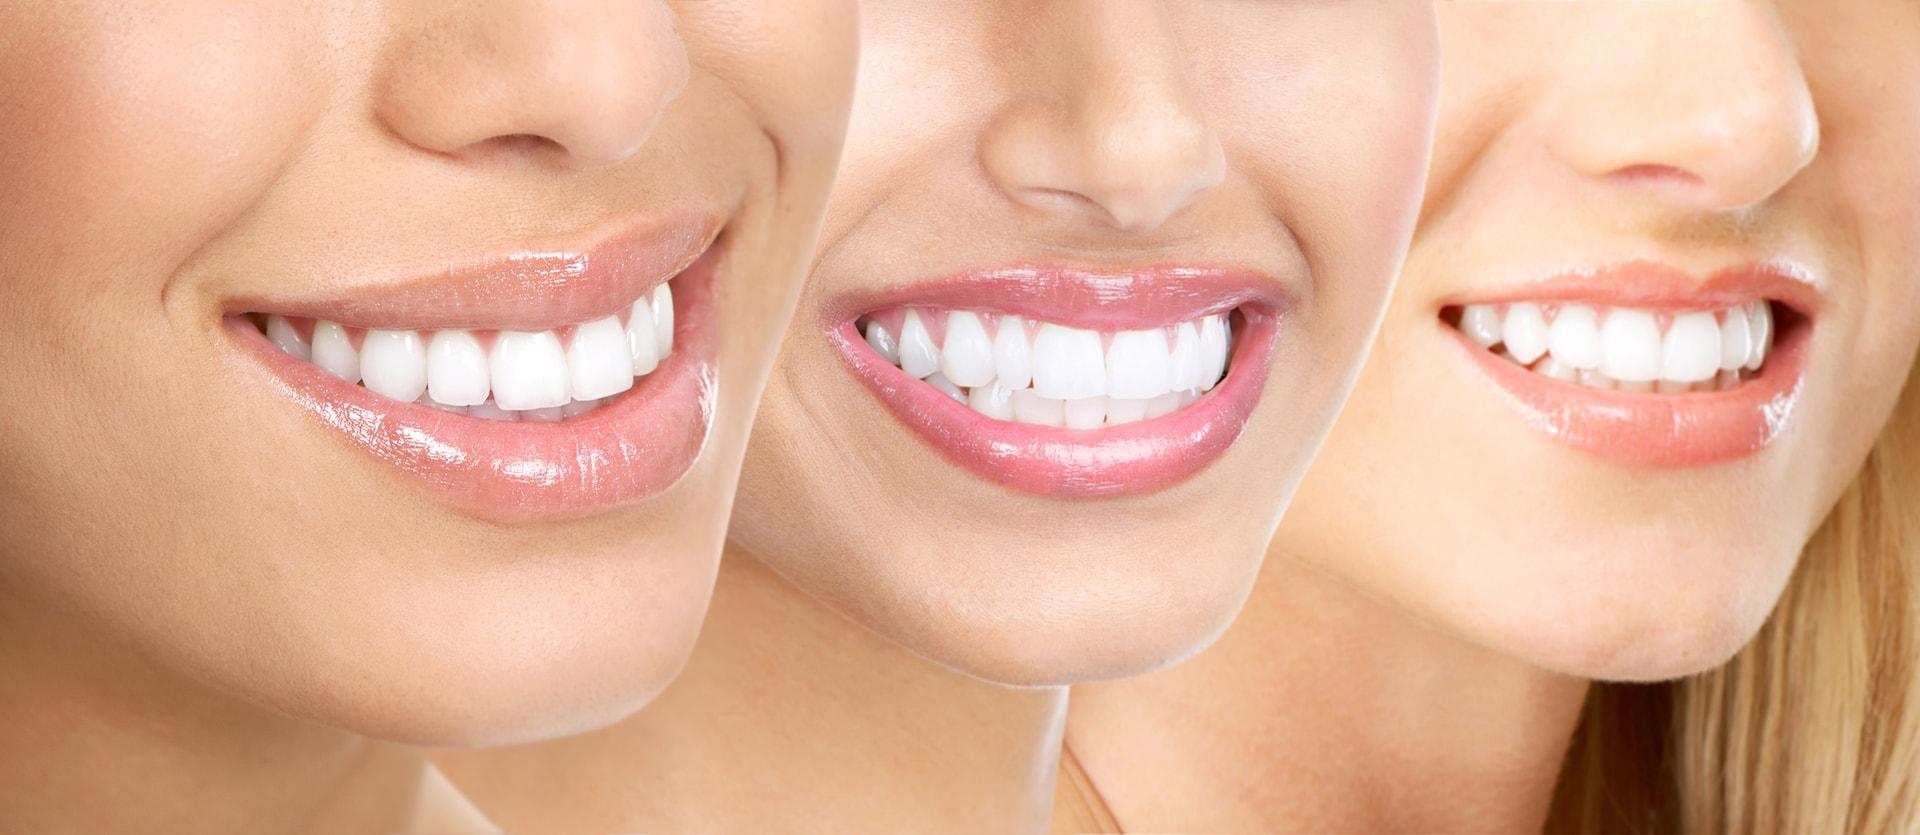 teeth_whitening